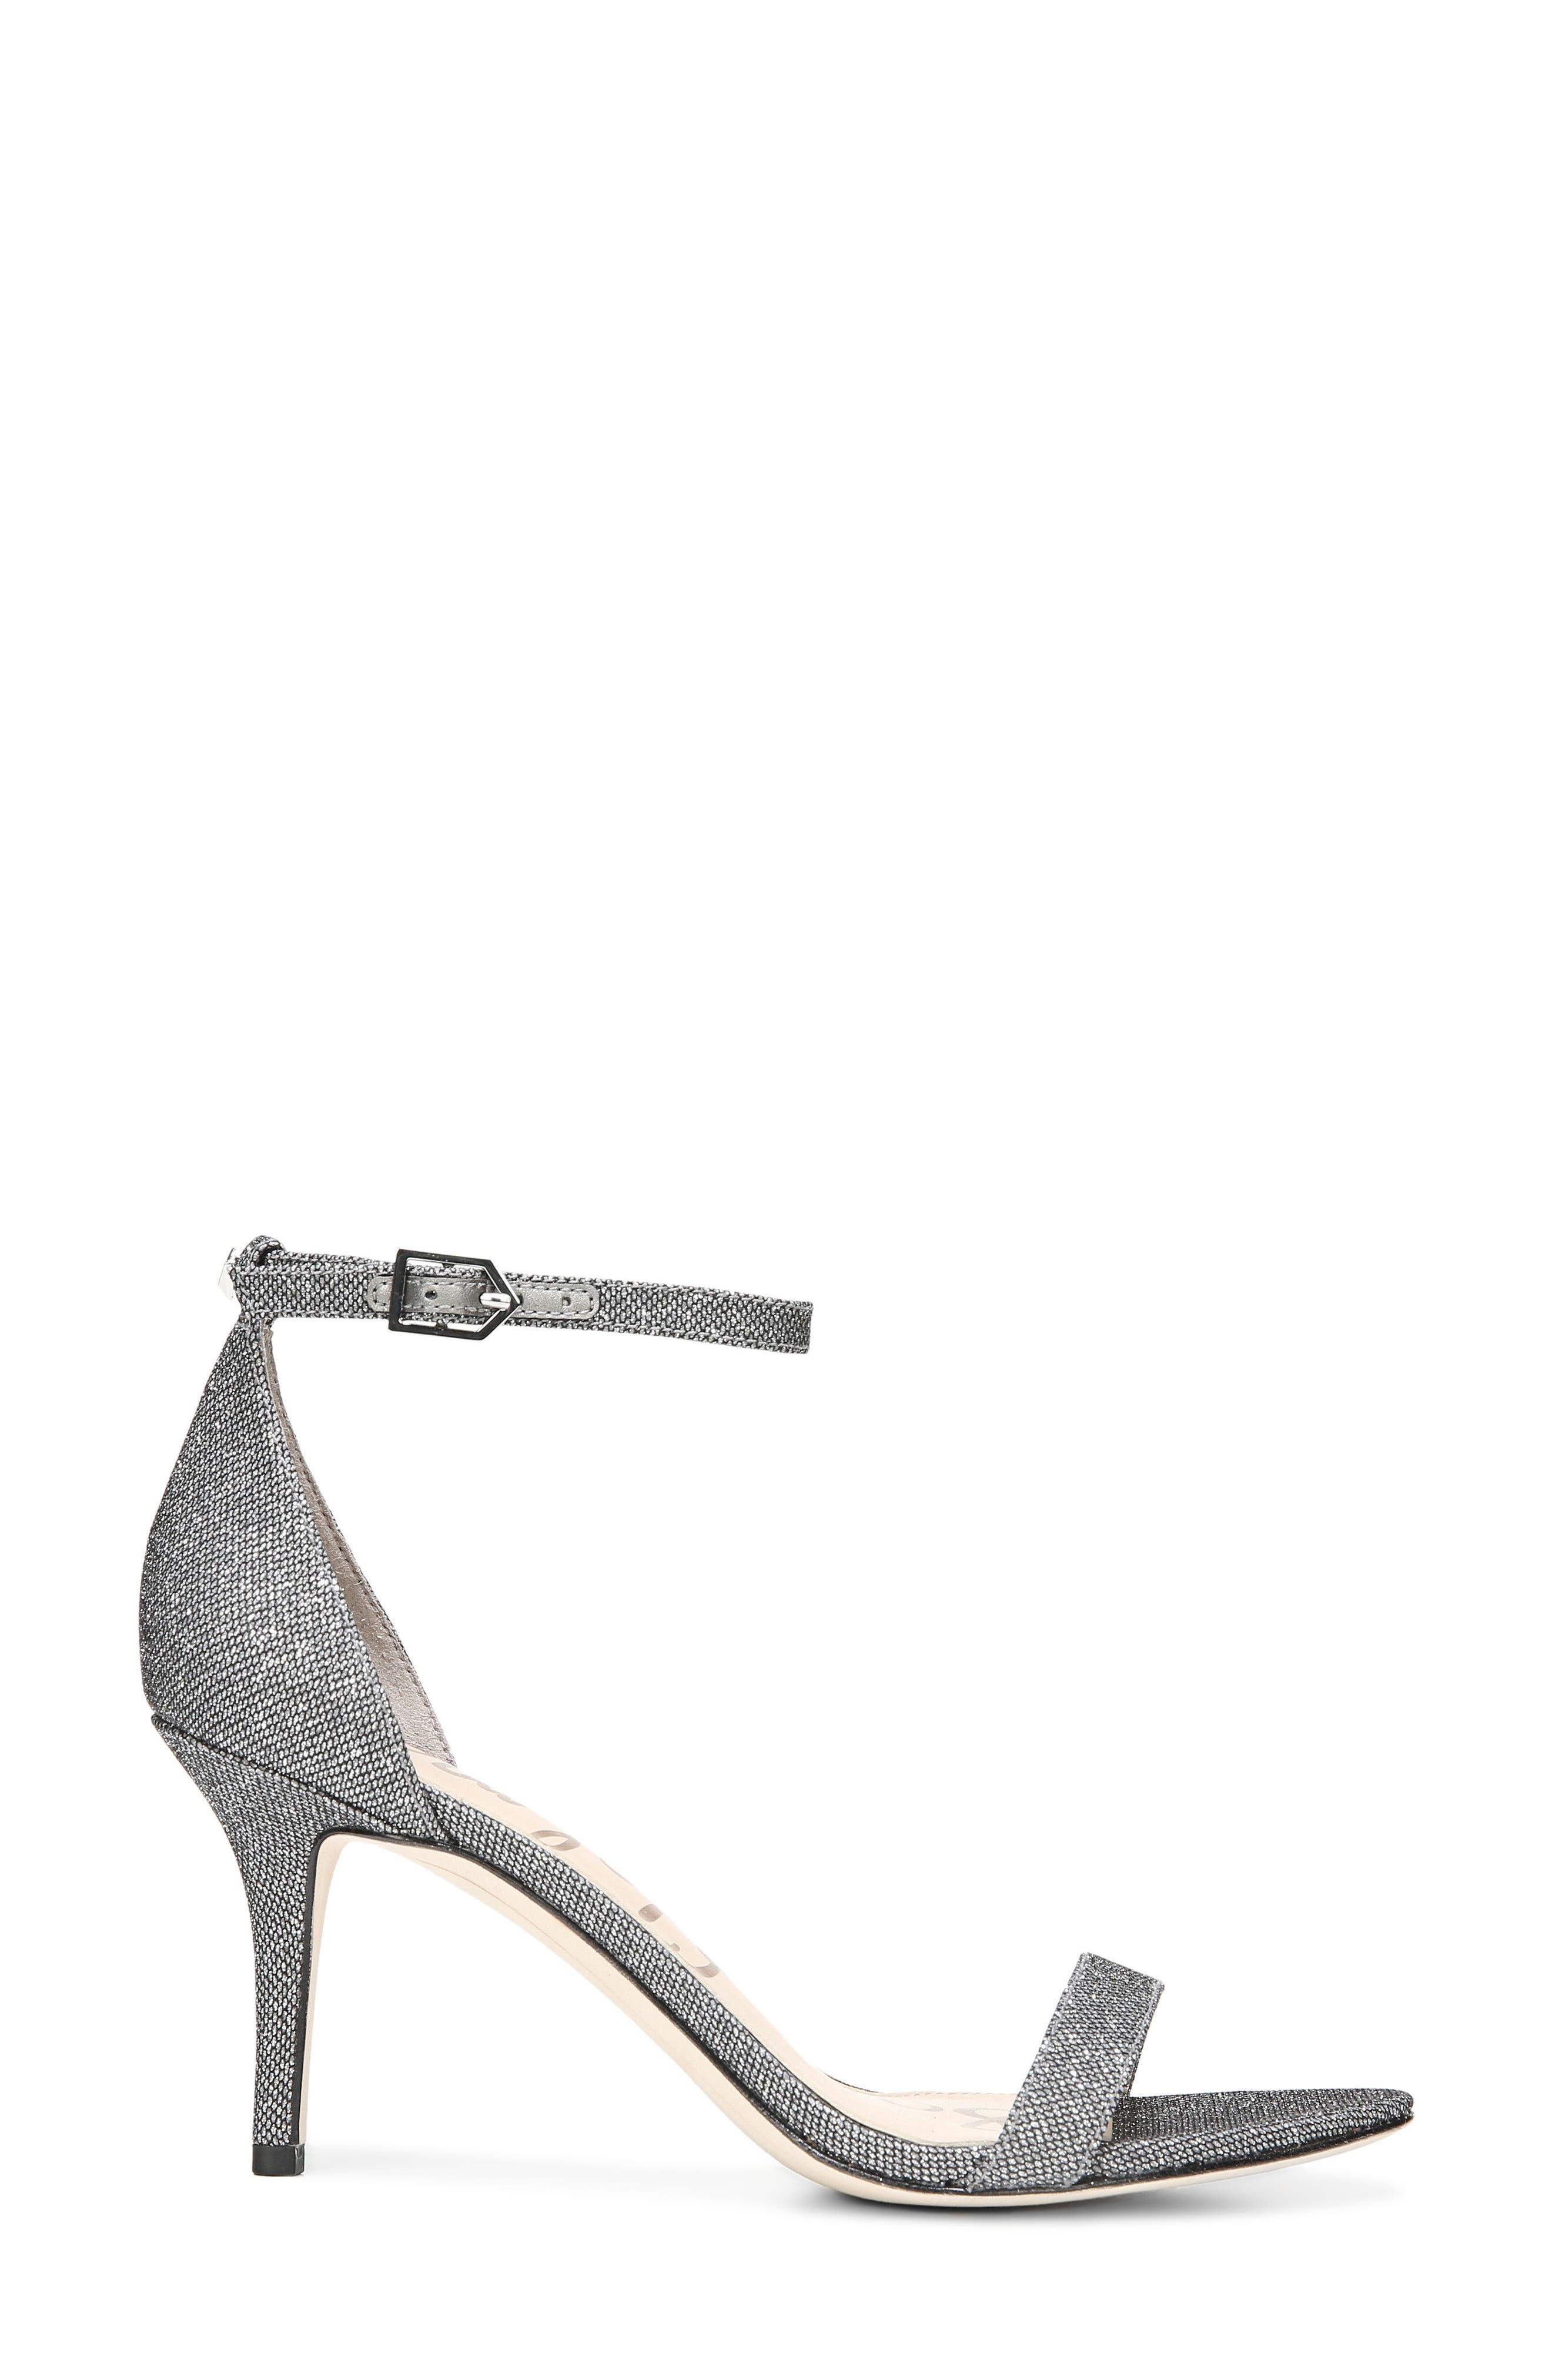 SAM EDELMAN, Patti Ankle Strap Sandal, Alternate thumbnail 3, color, PEWTER FABRIC